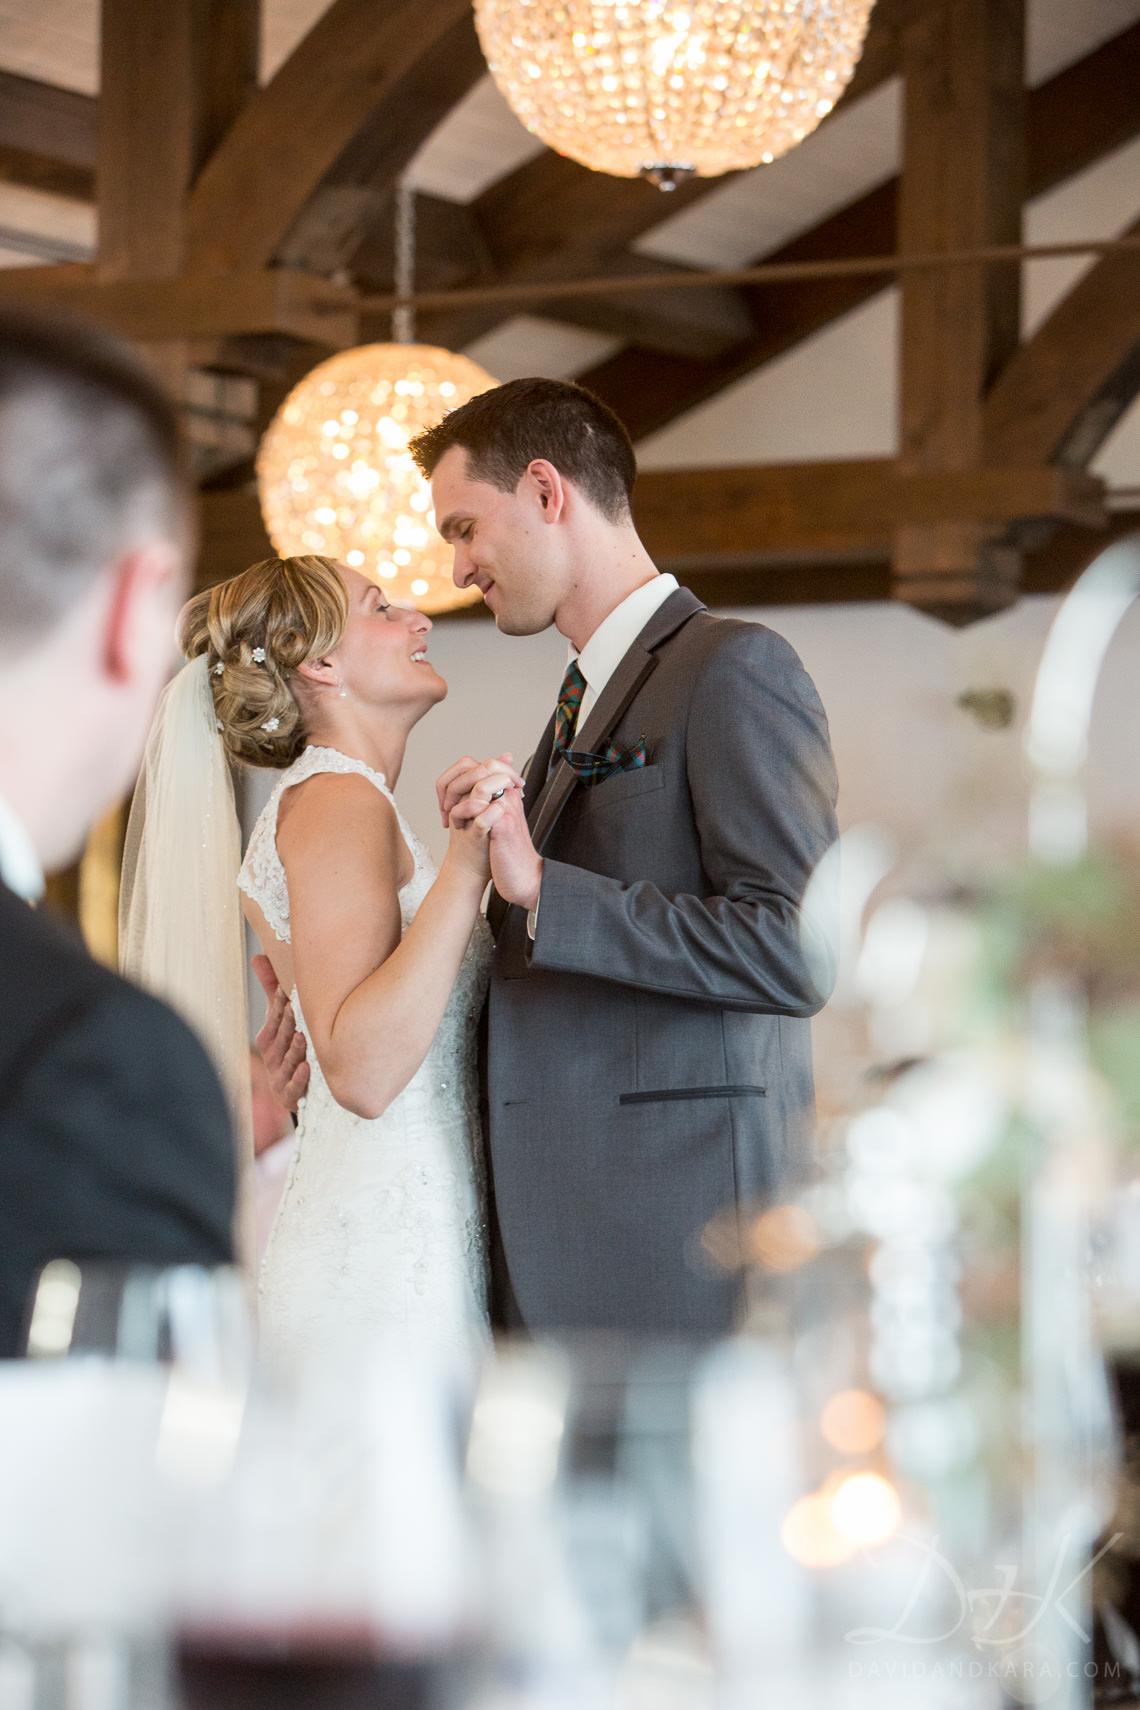 cambridge wedding photographers lindsay ross 39 whistle. Black Bedroom Furniture Sets. Home Design Ideas